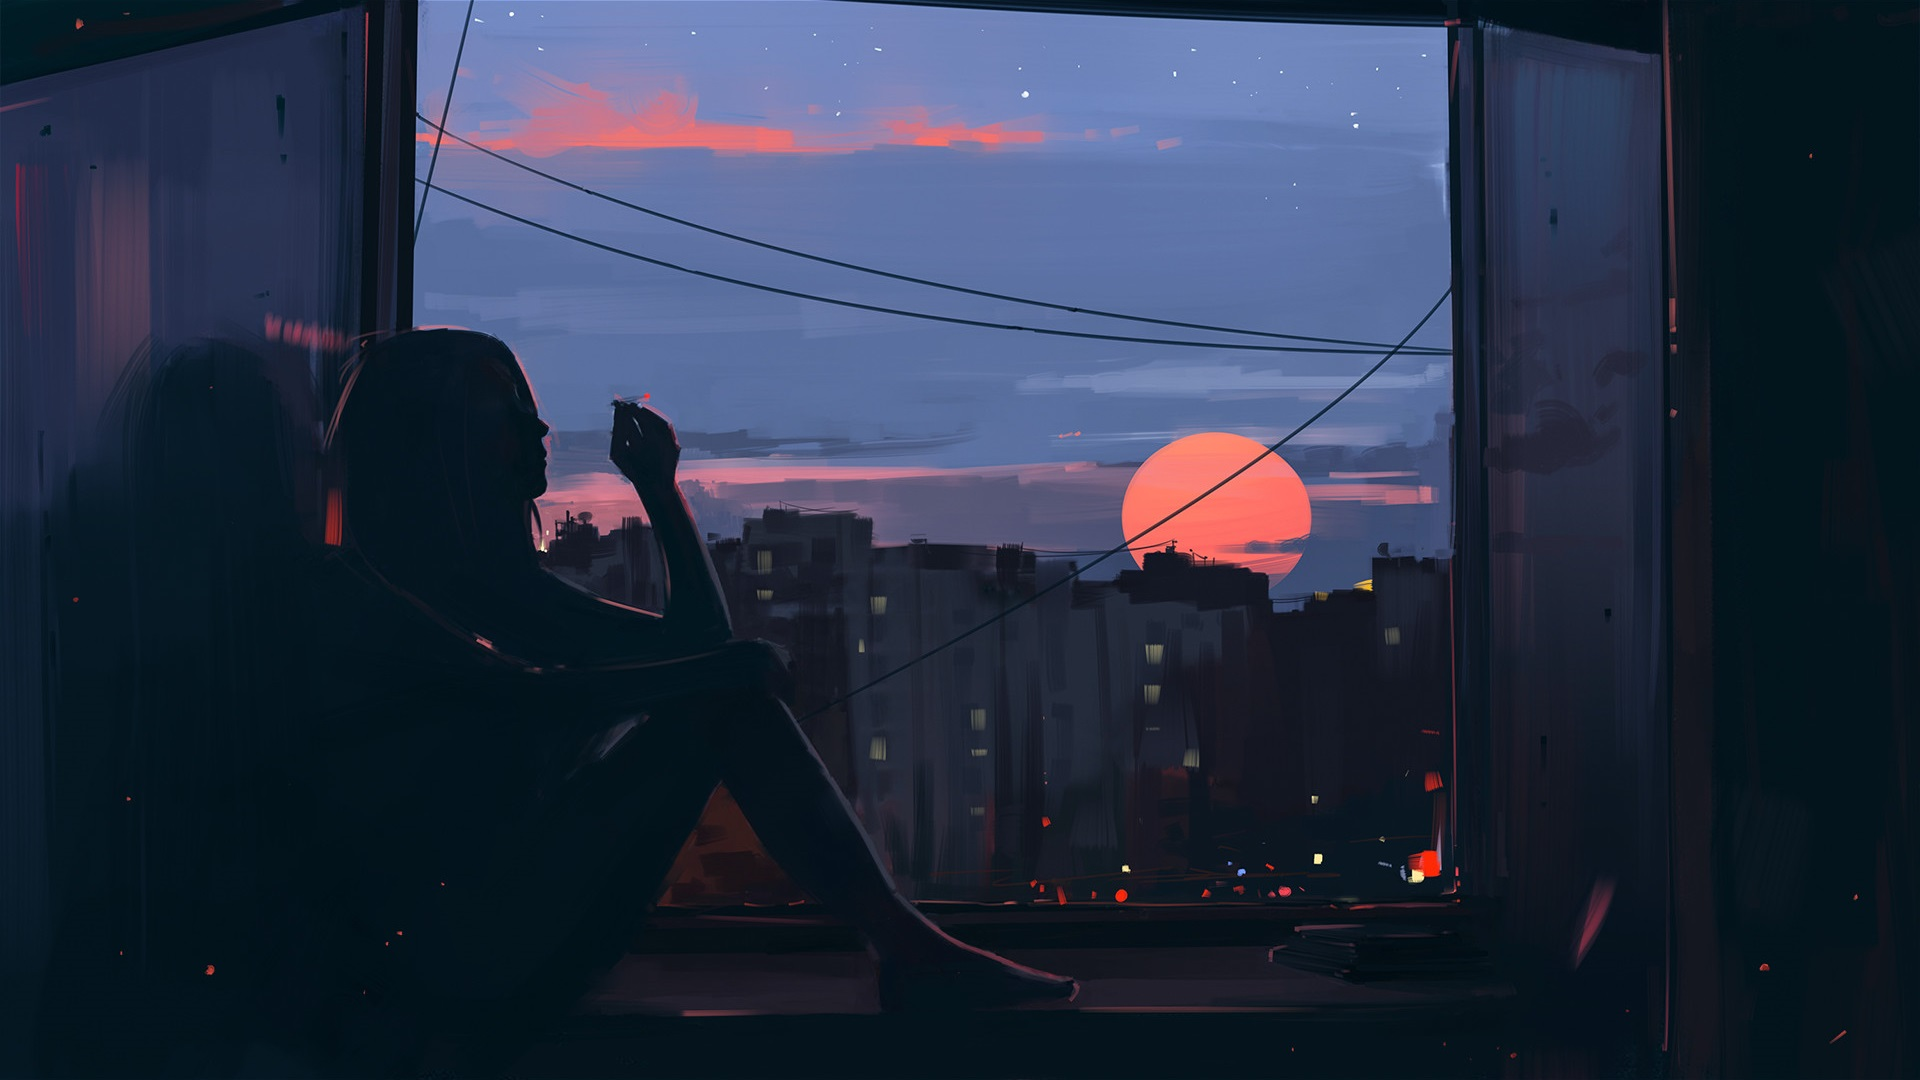 General 1920x1080 women dark window sunset city smoking barefoot artwork women indoors Aenami cigarettes digital digital art silhouette